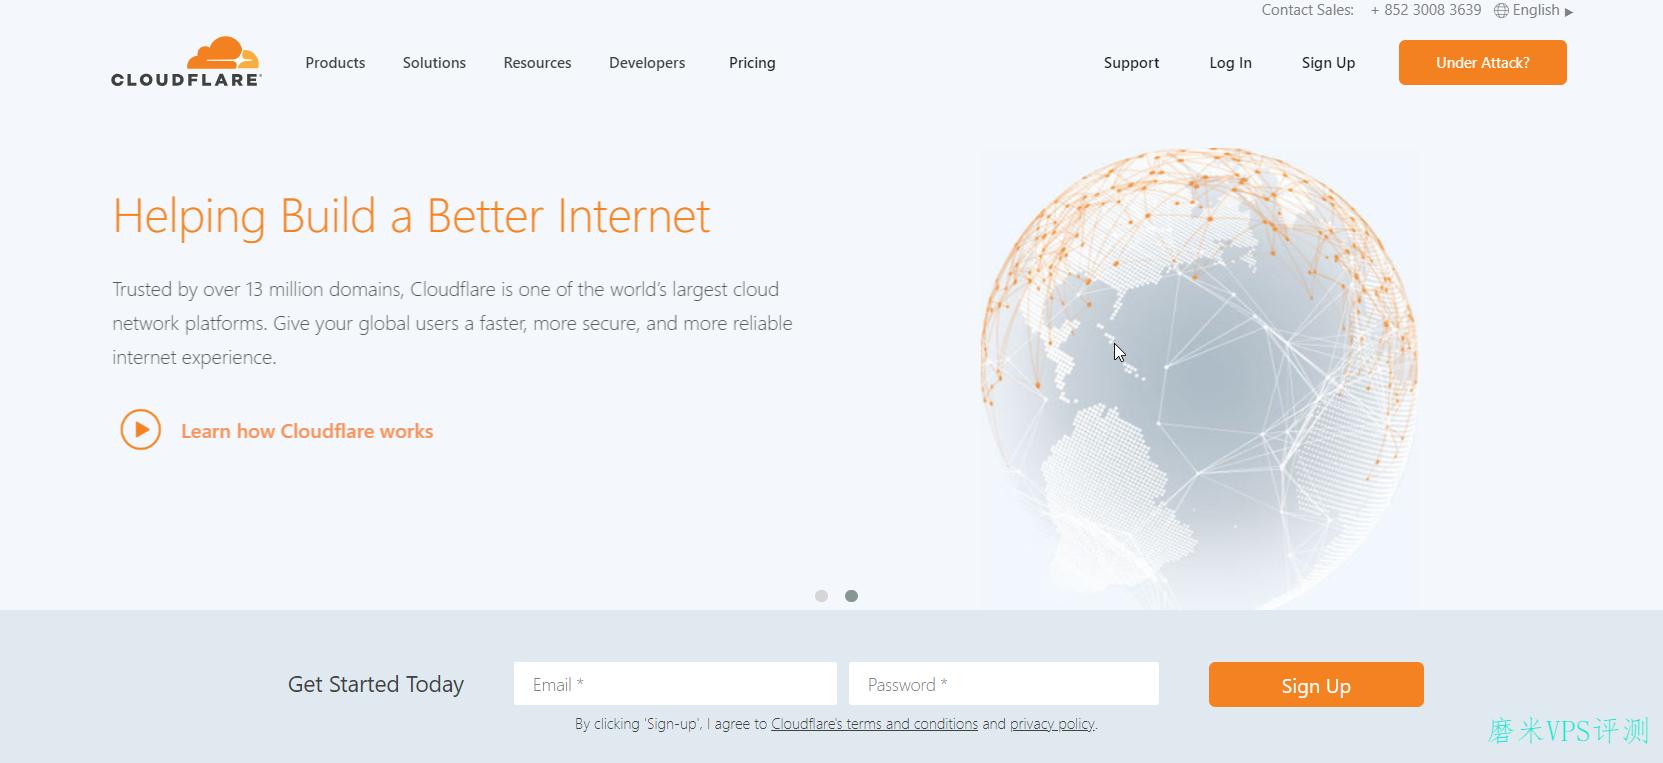 CloudFlare Partner申请及程序部署